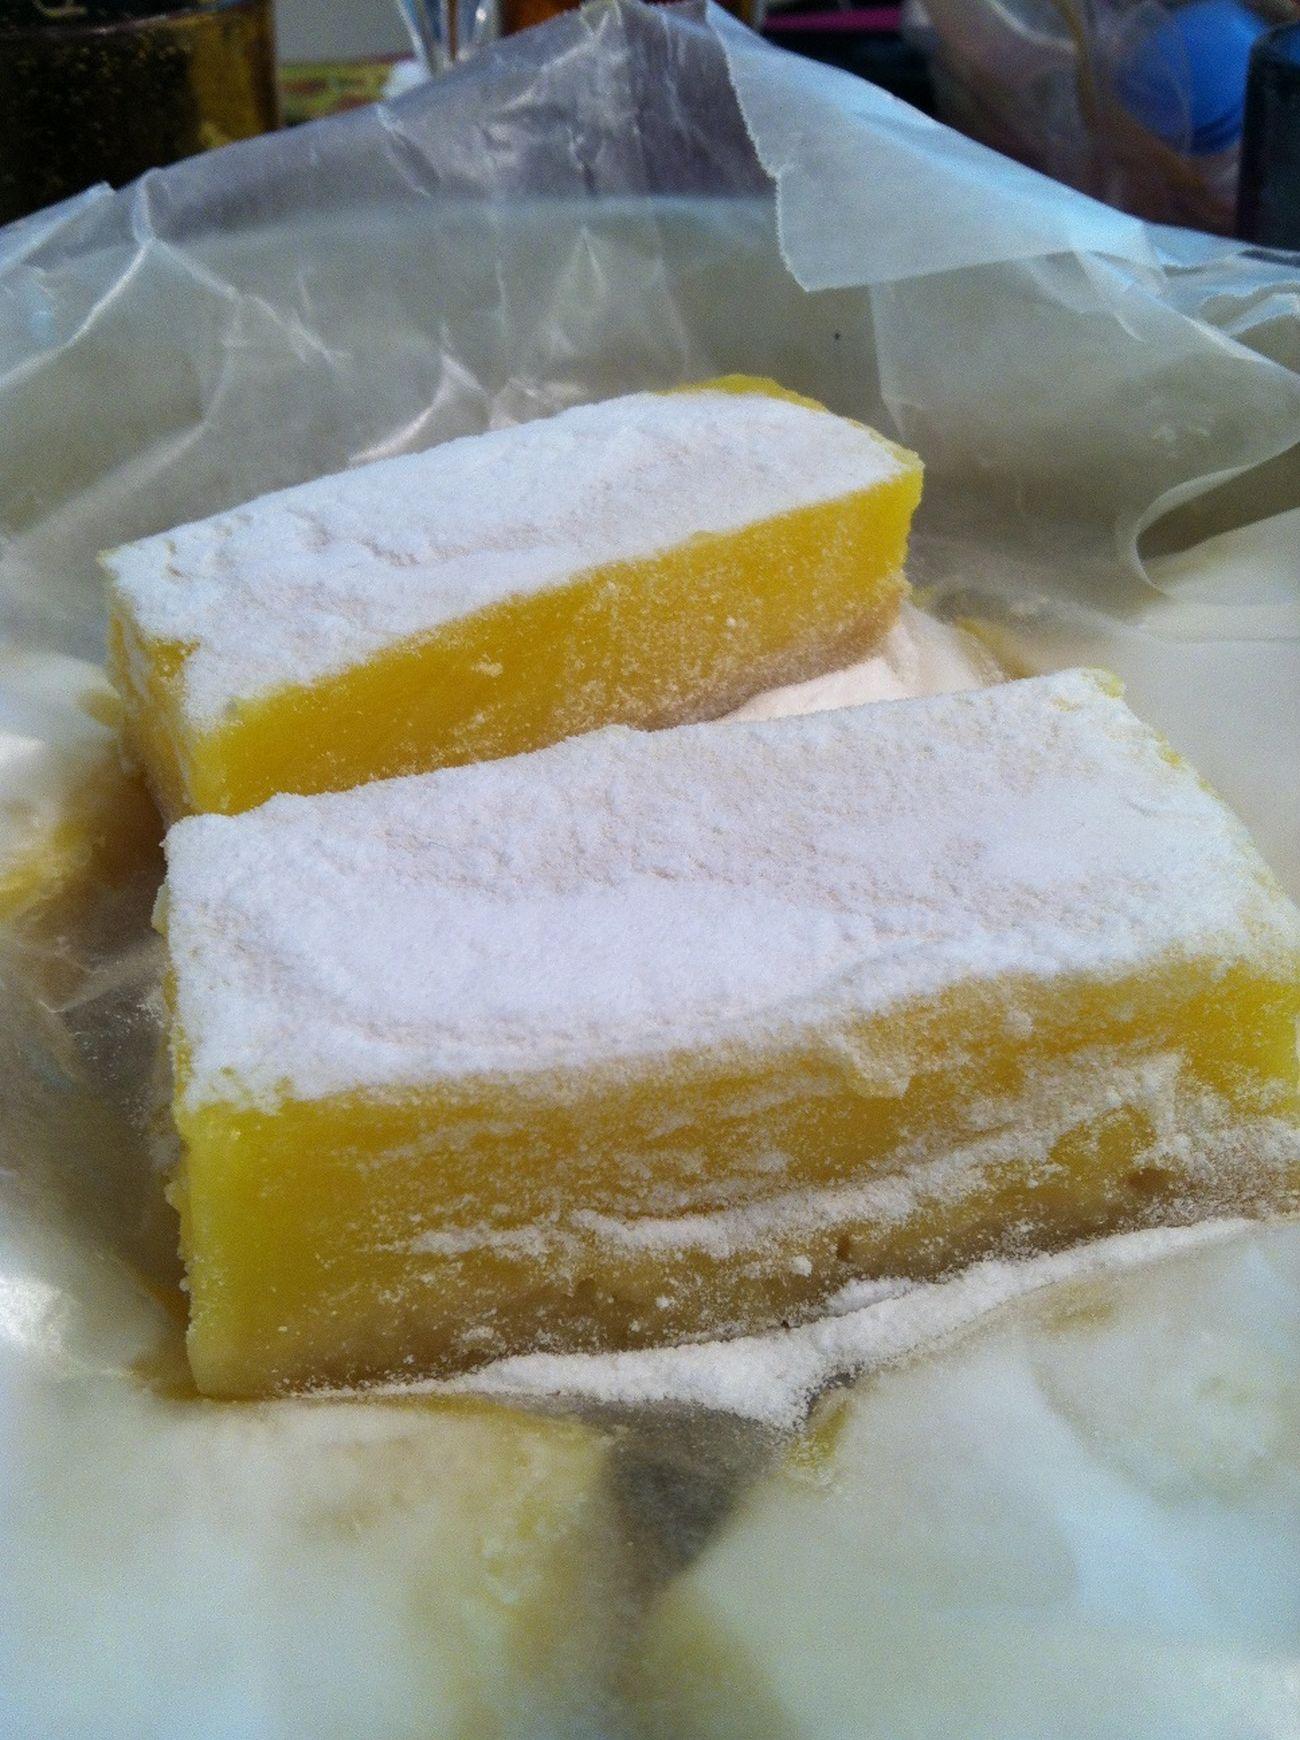 Aunts handmade lemon bars